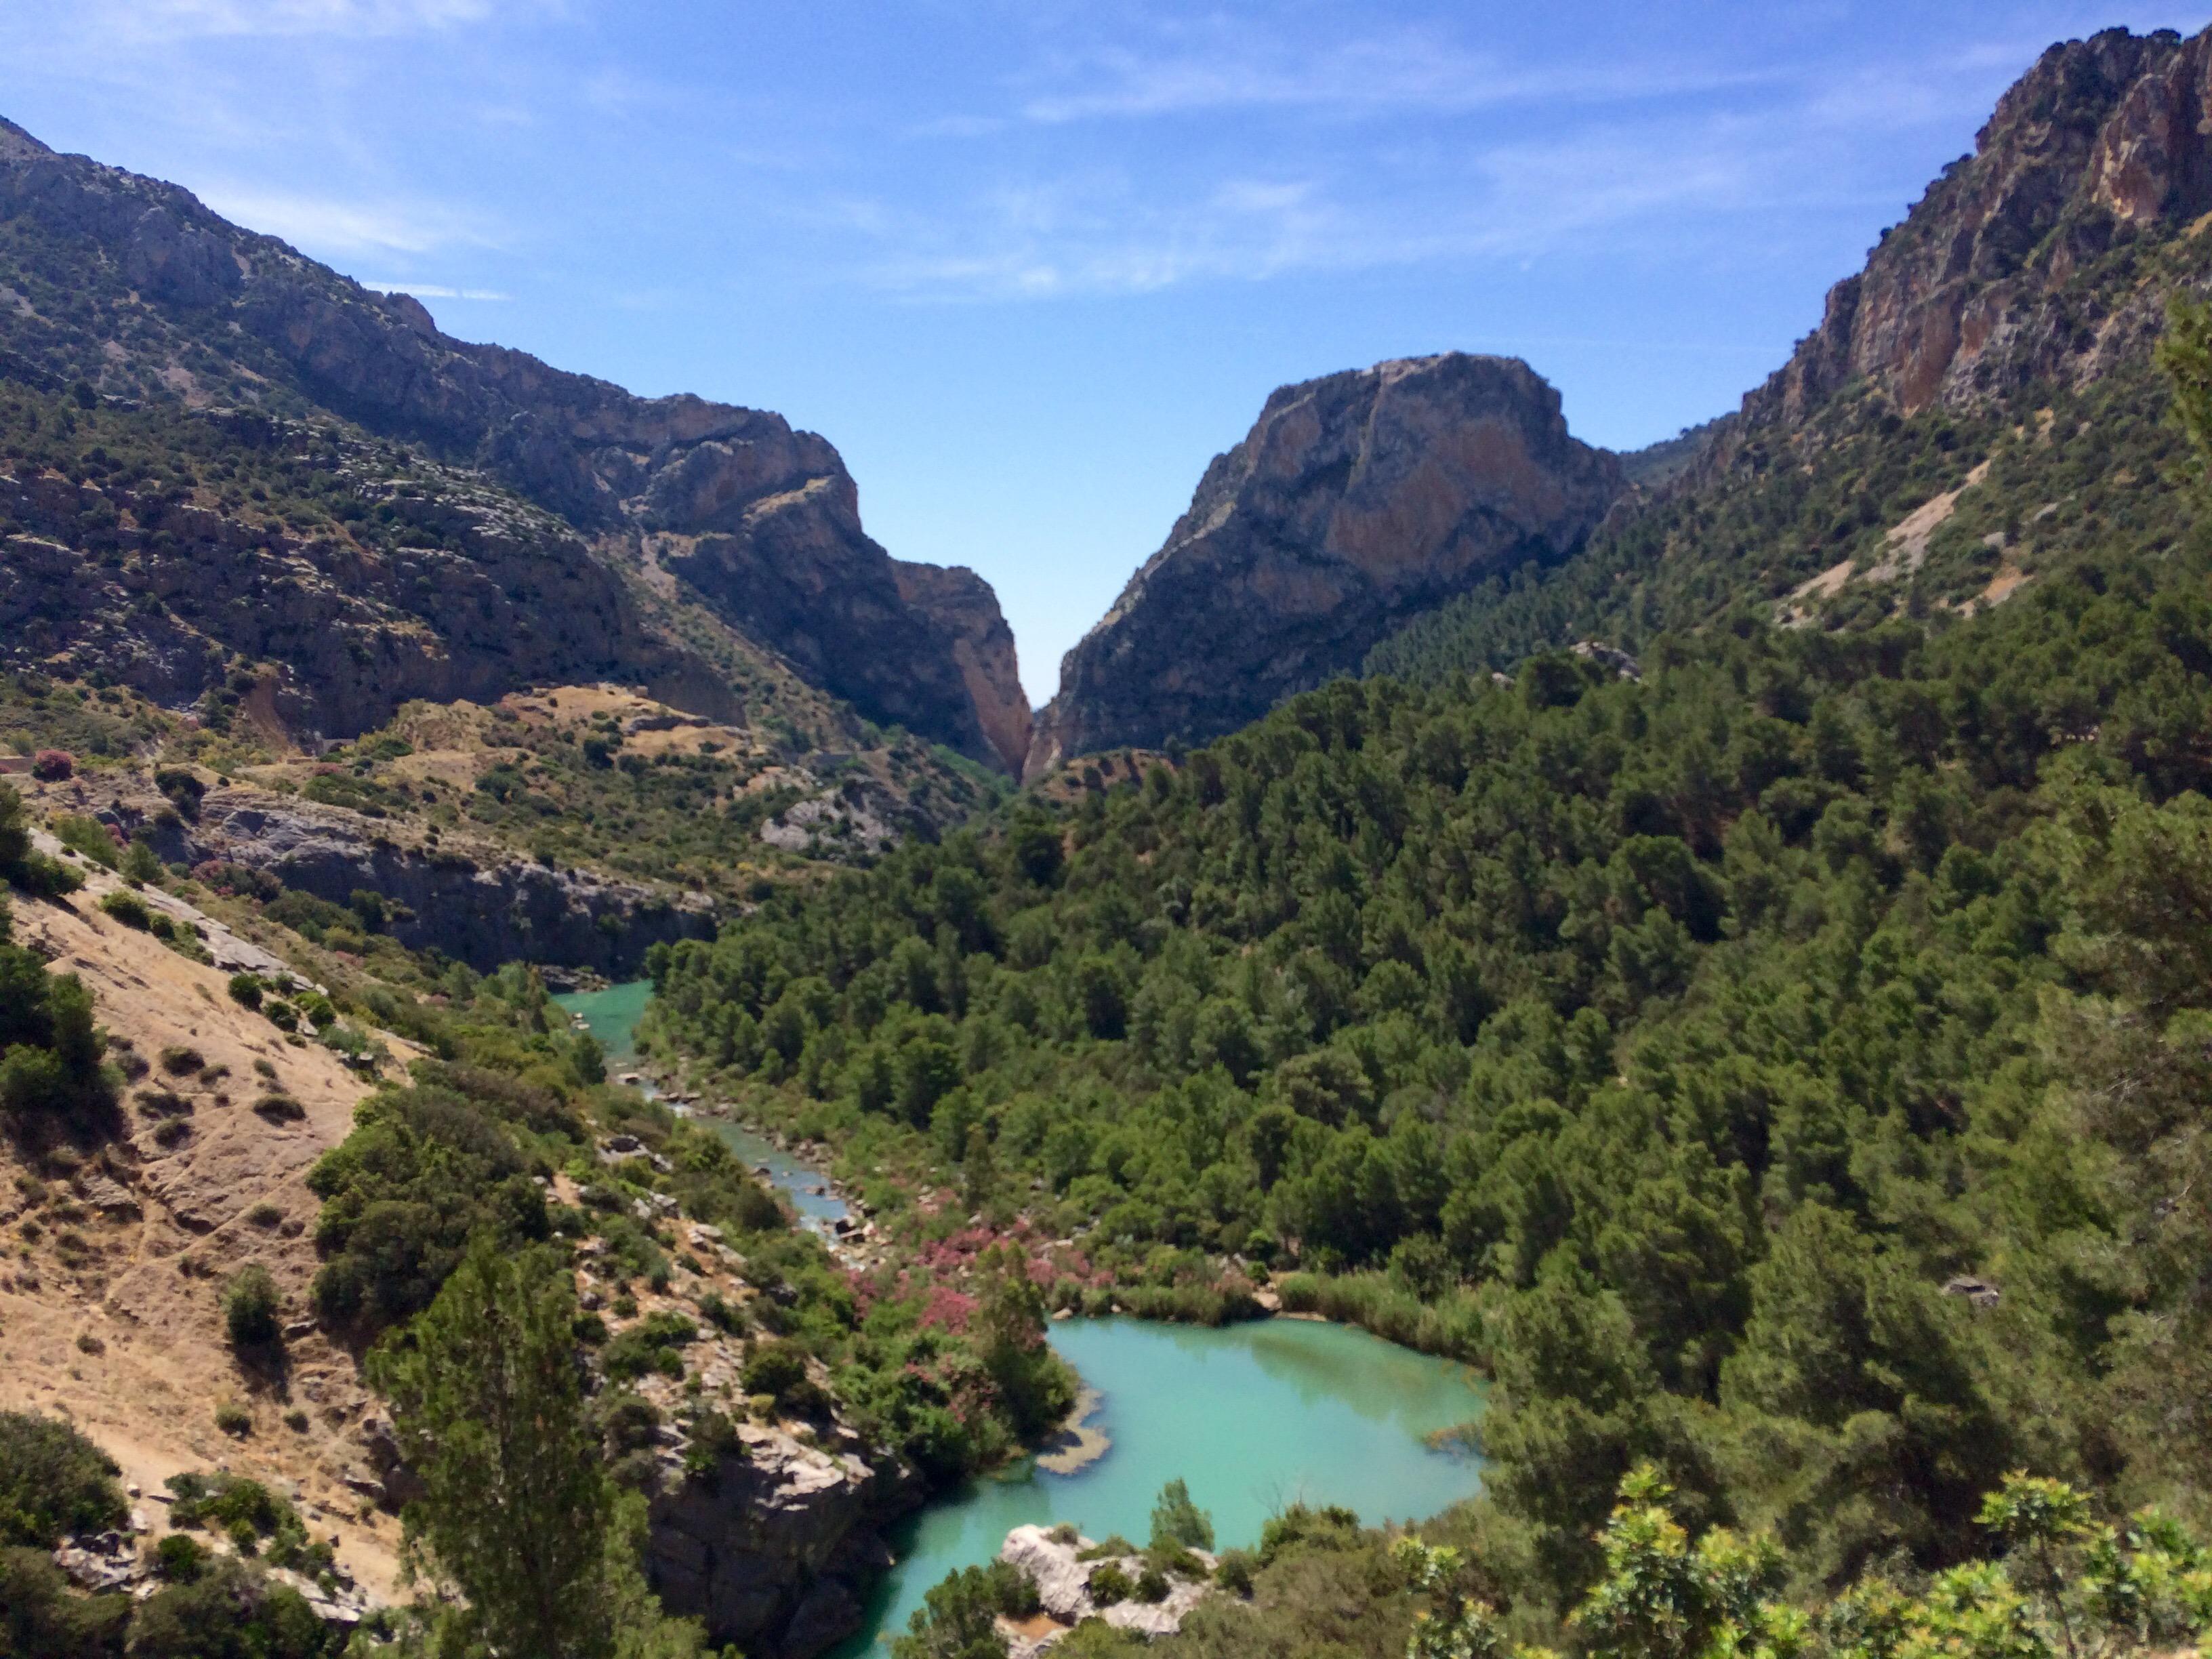 Andalousie Carte Didentite.Transeurope Promotion Espagne Andalucia Circuit 8 Jours